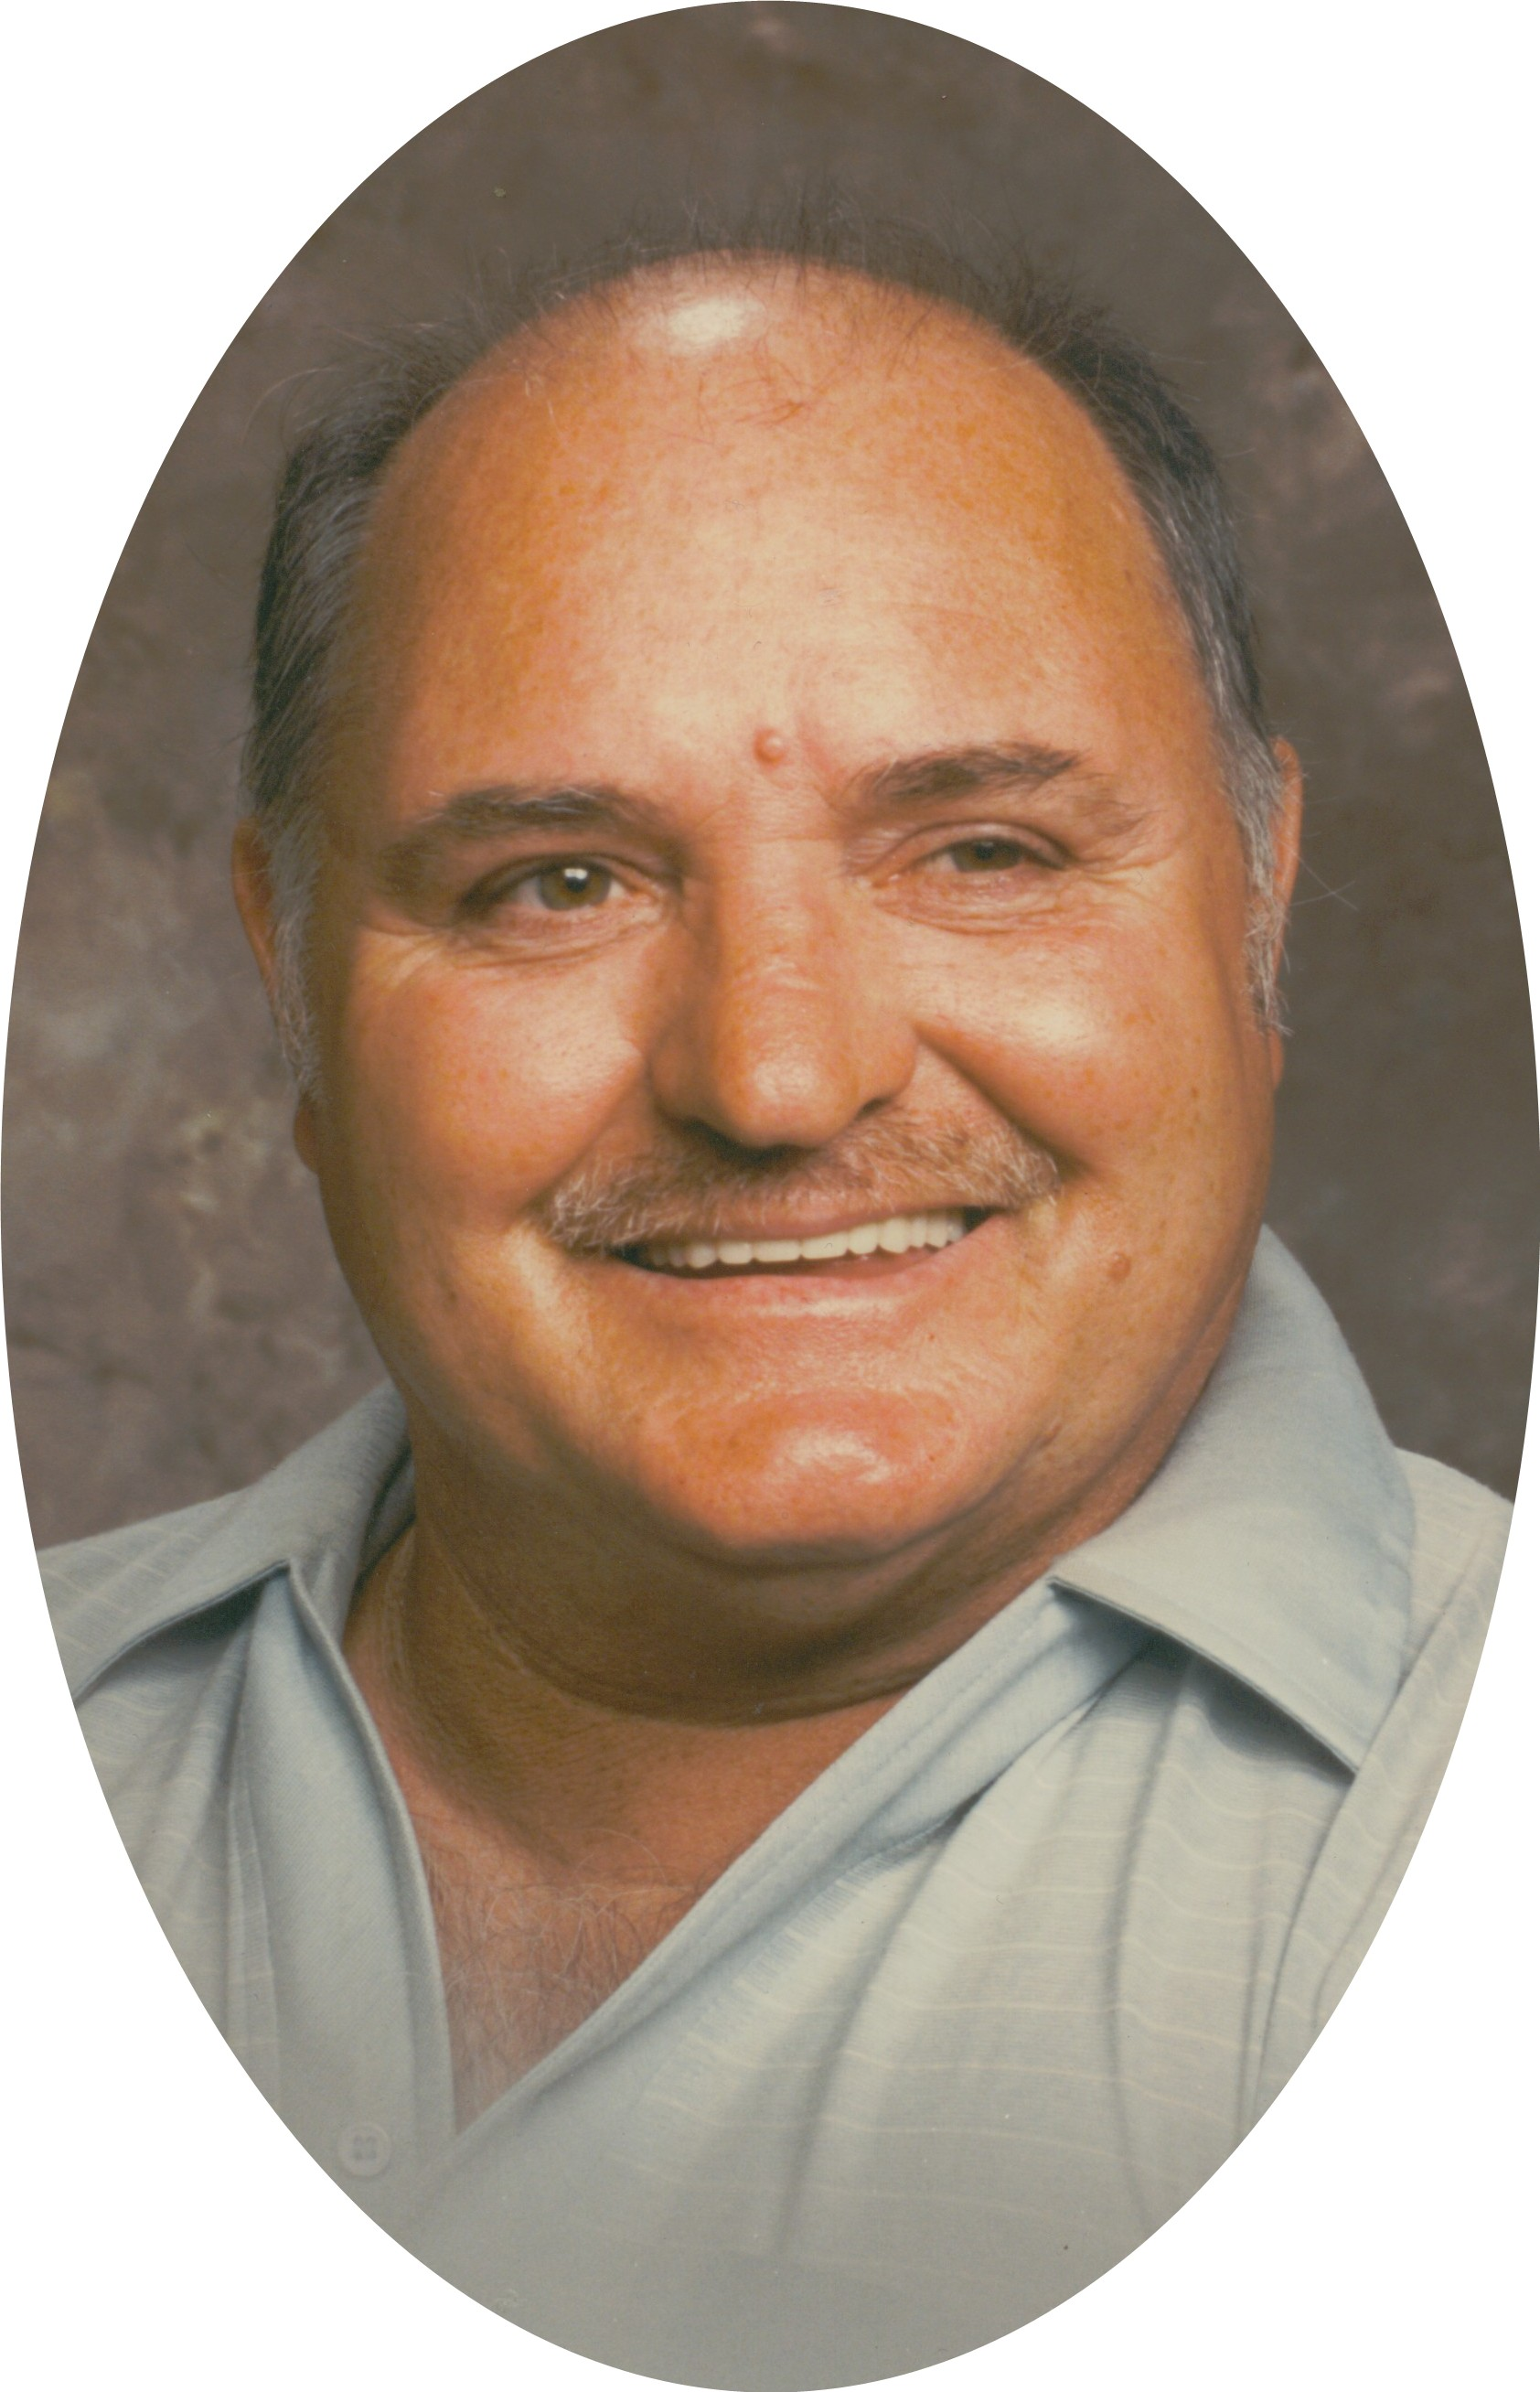 Thurman J. 'Rigg' Scholey